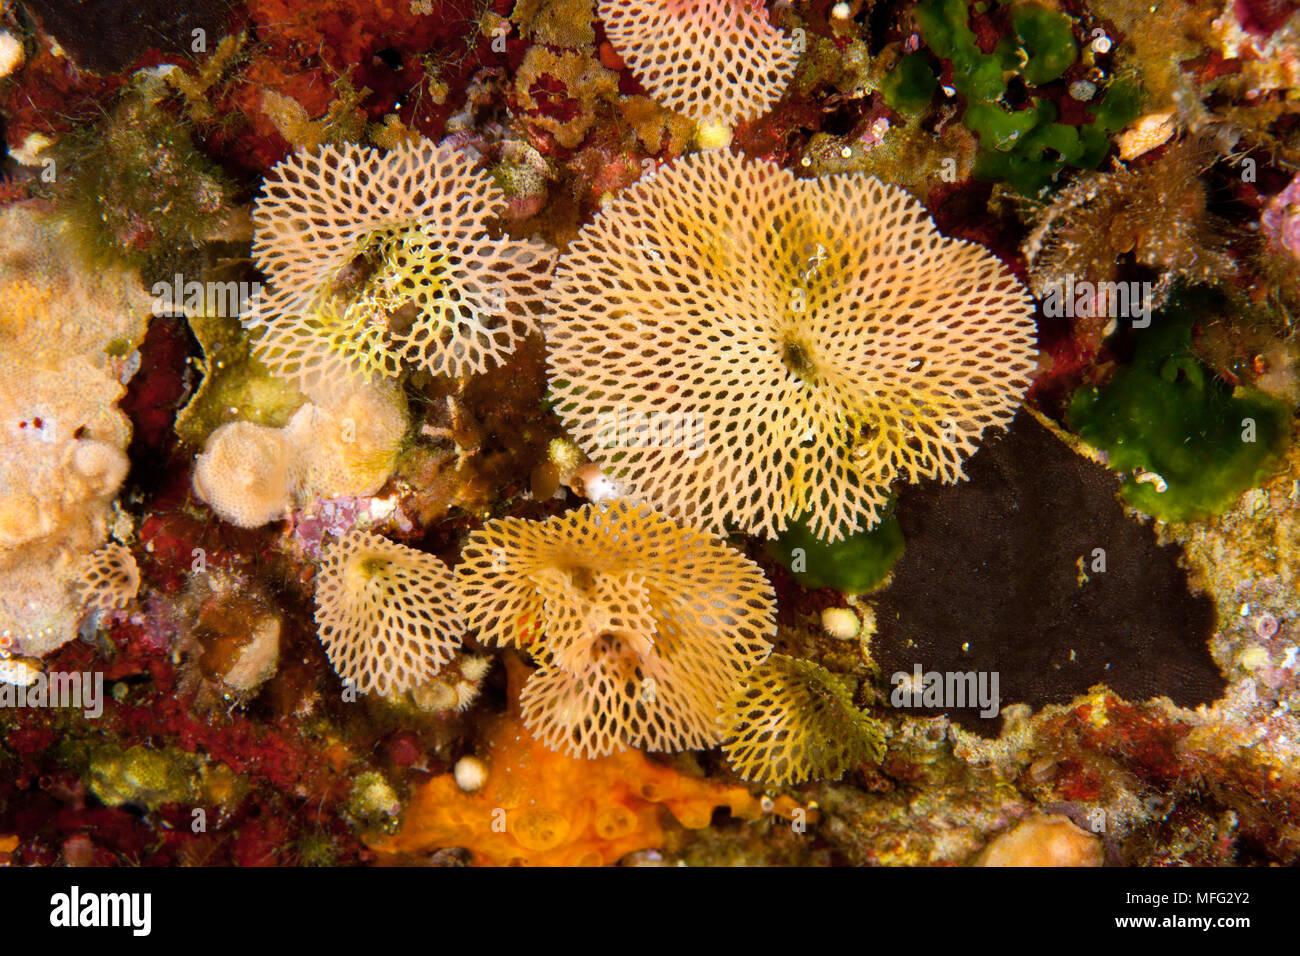 Bryozoa Or Bryozoan Stockfotos & Bryozoa Or Bryozoan Bilder - Alamy